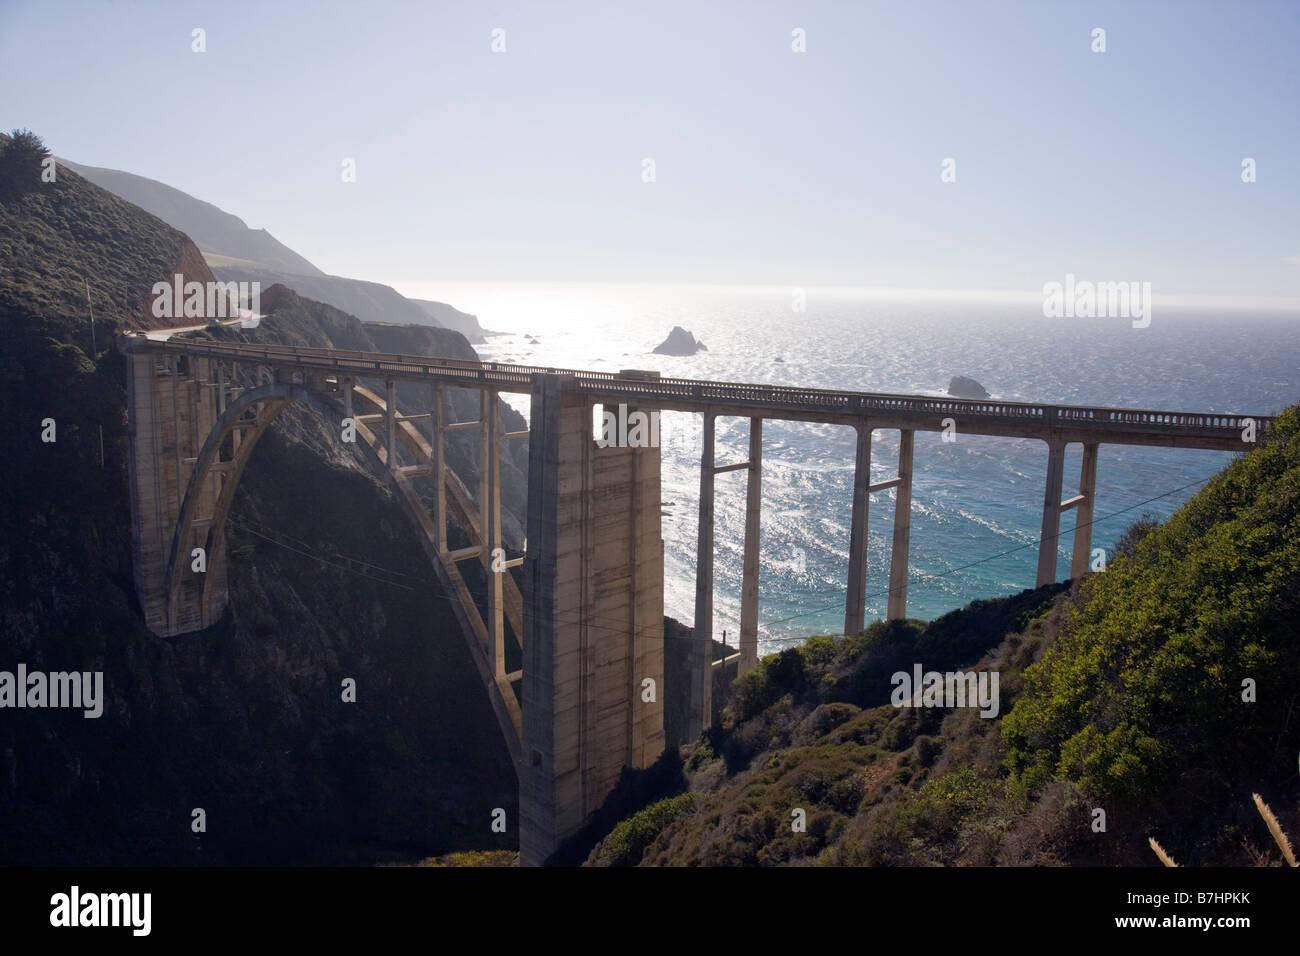 Bixby Bridge, Highway 1, Big Sur, Pacific coast, California, USA - Stock Image